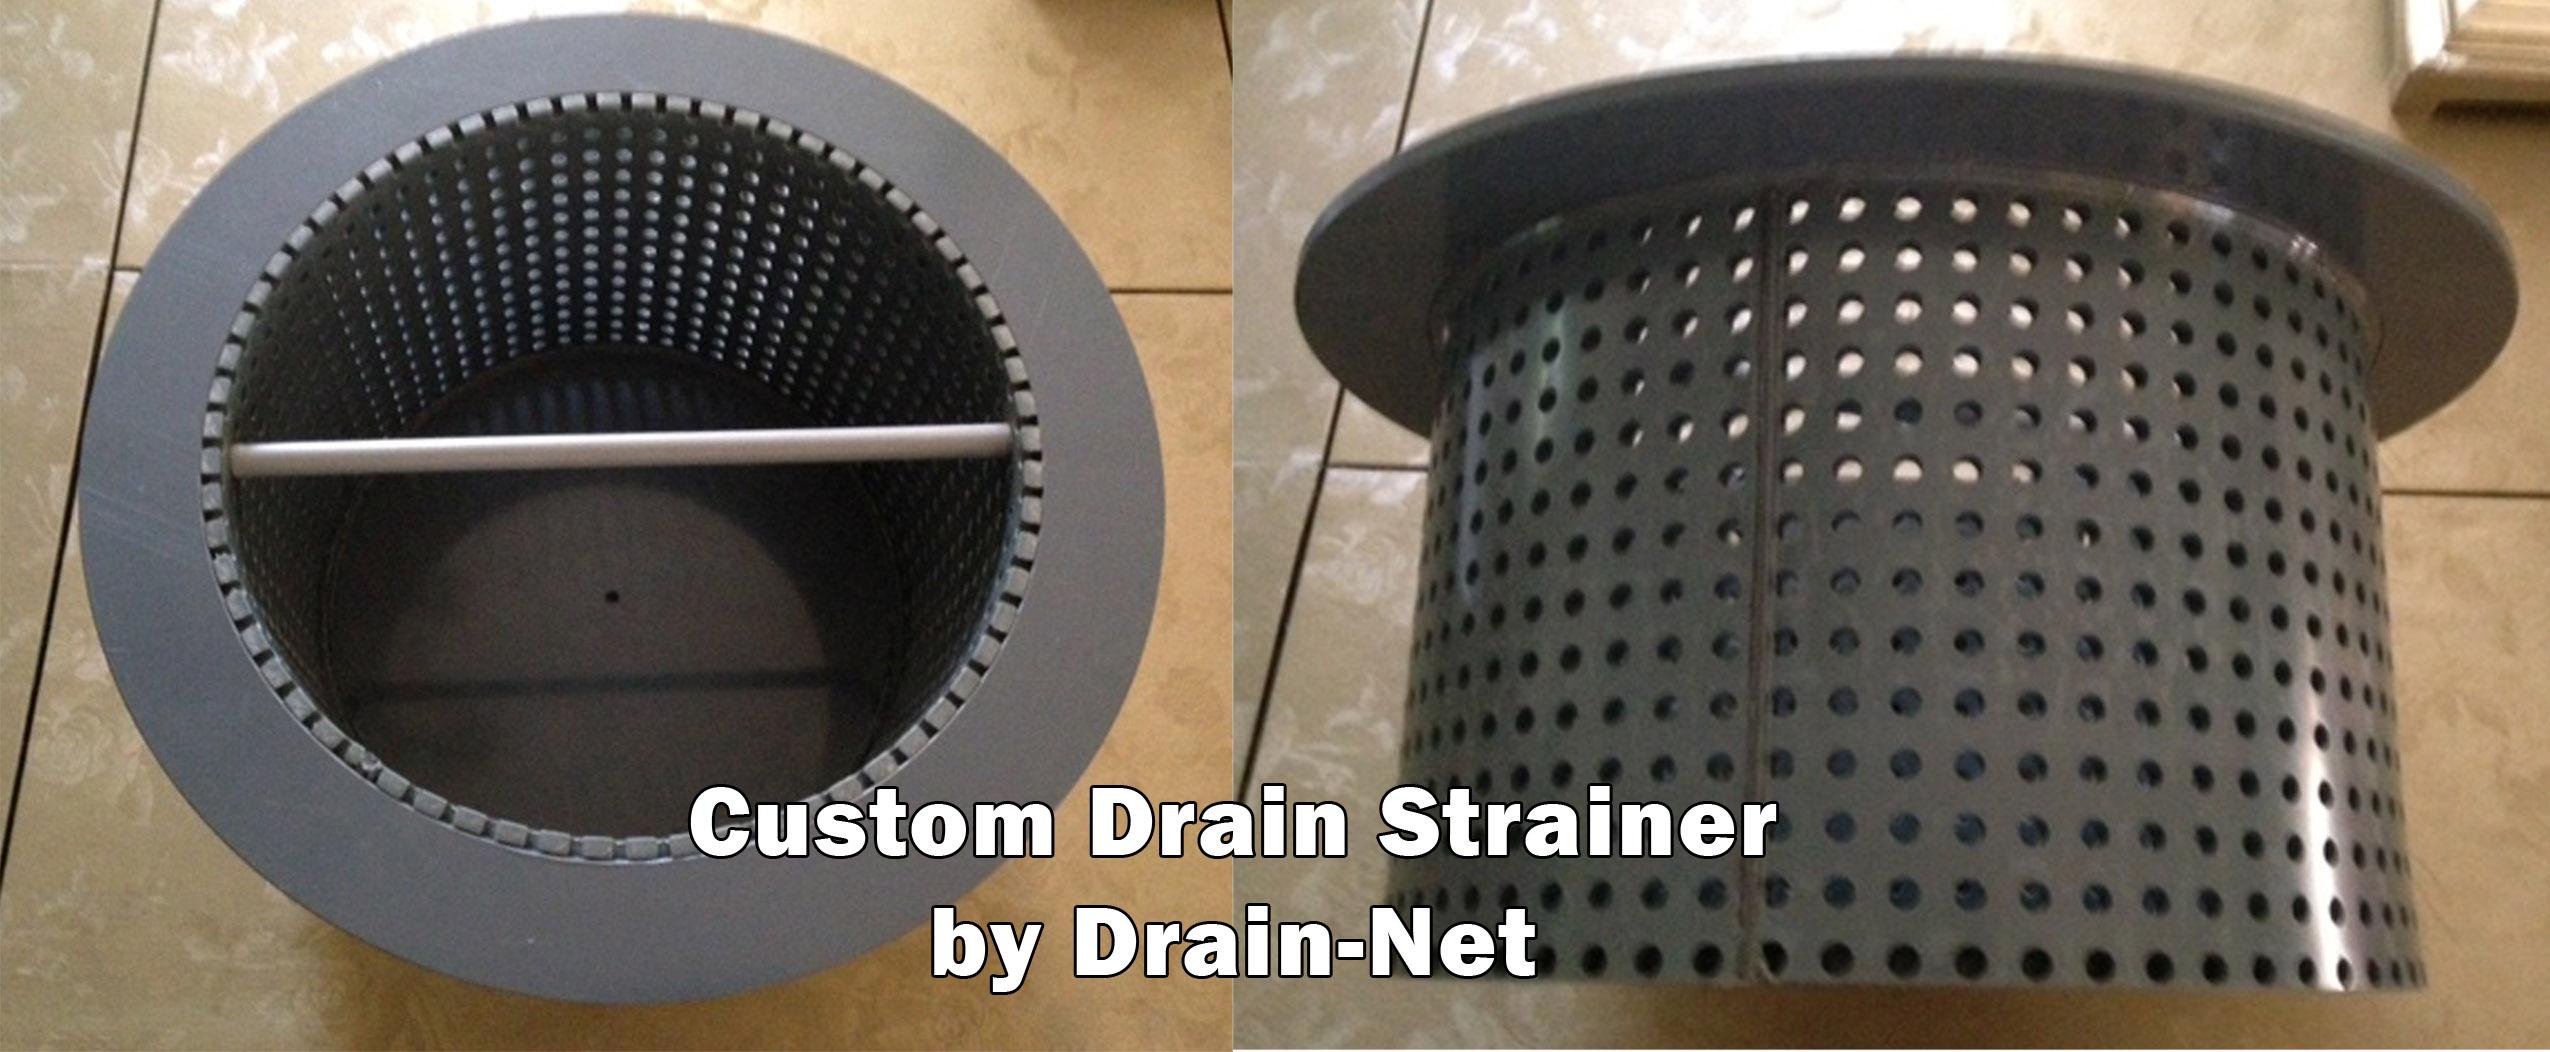 custom-drain-strainer-by-drain-net image